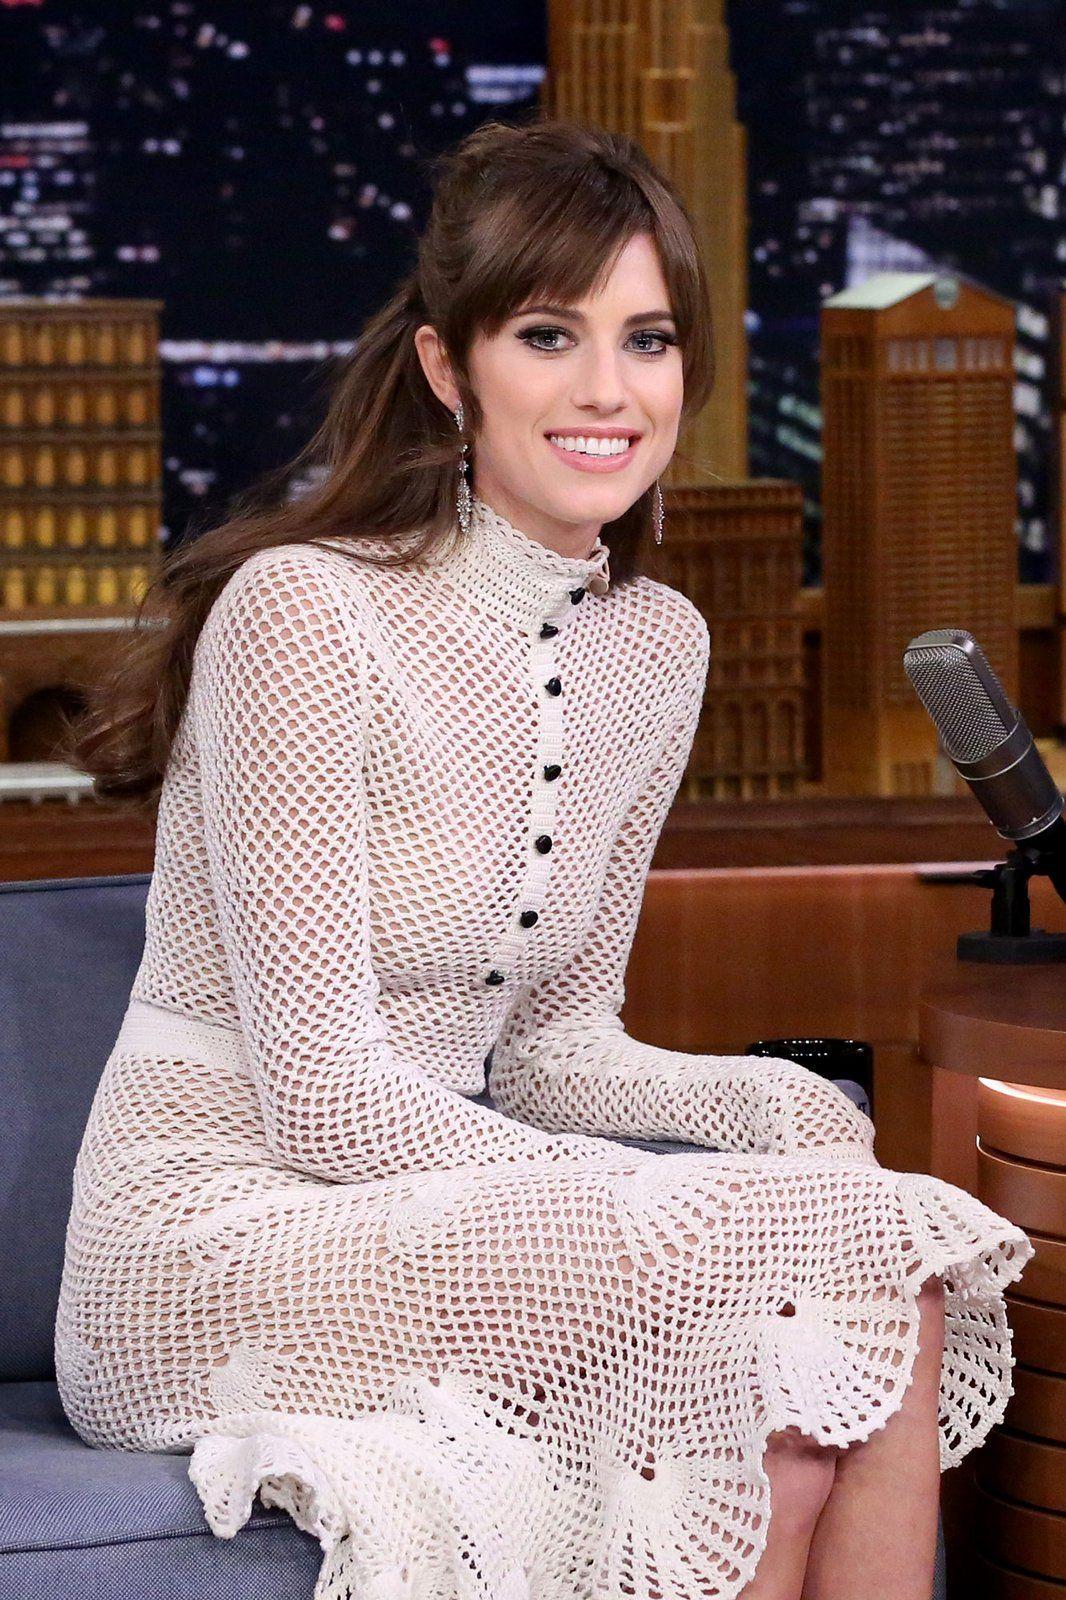 Allison williams wedding dress  The Best Beauty Looks of the Week Olivia Munn Jennifer Lawrence